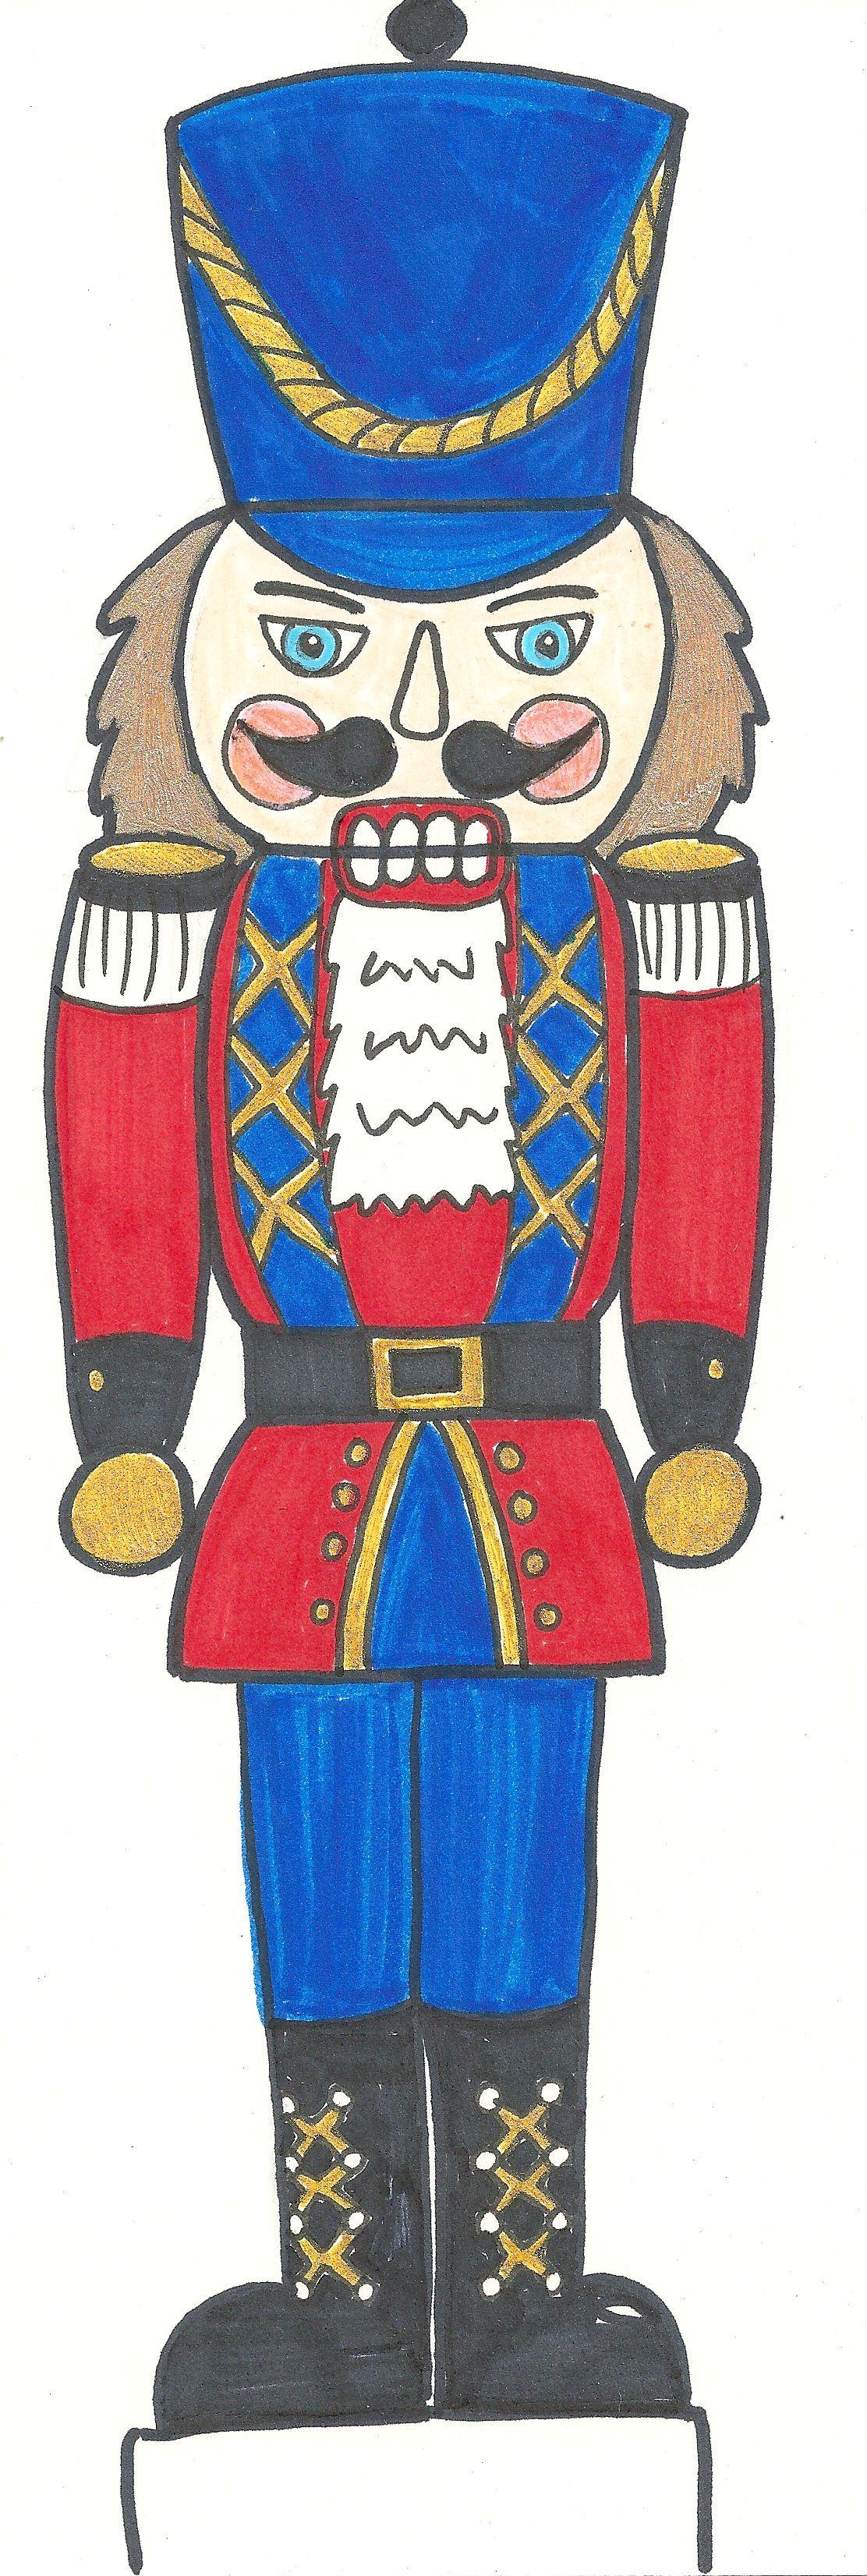 Free Nutcracker Coloring Sheet | Paper christmas ornaments ...